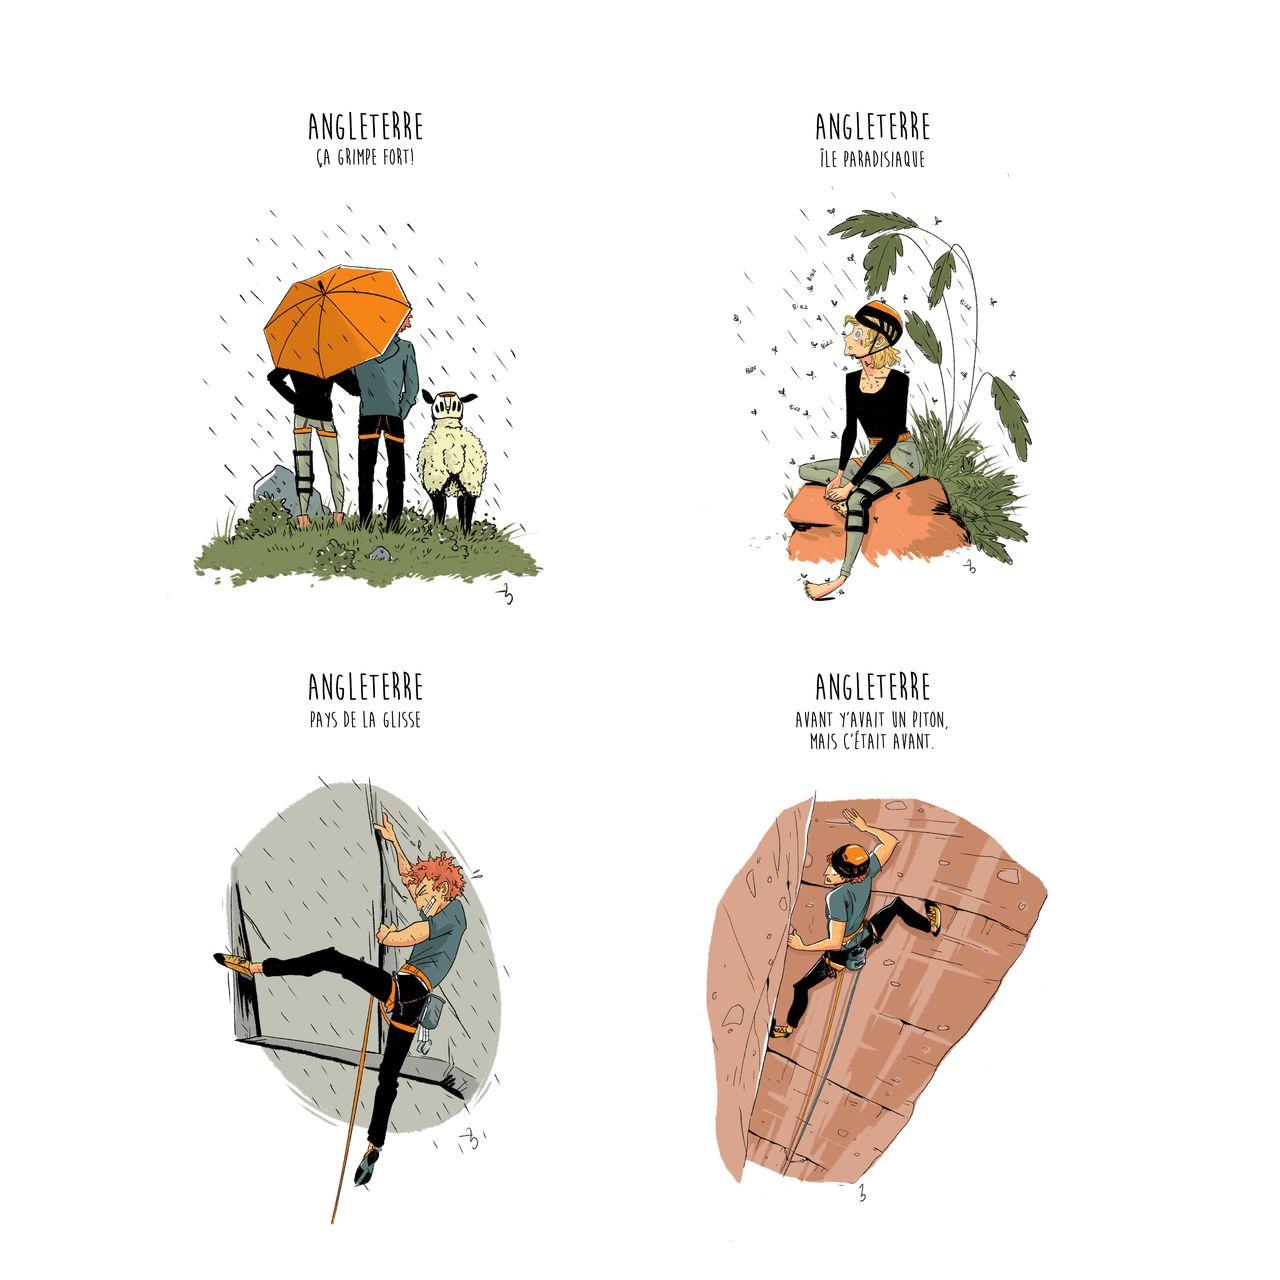 Carnet de voyage - illustrations